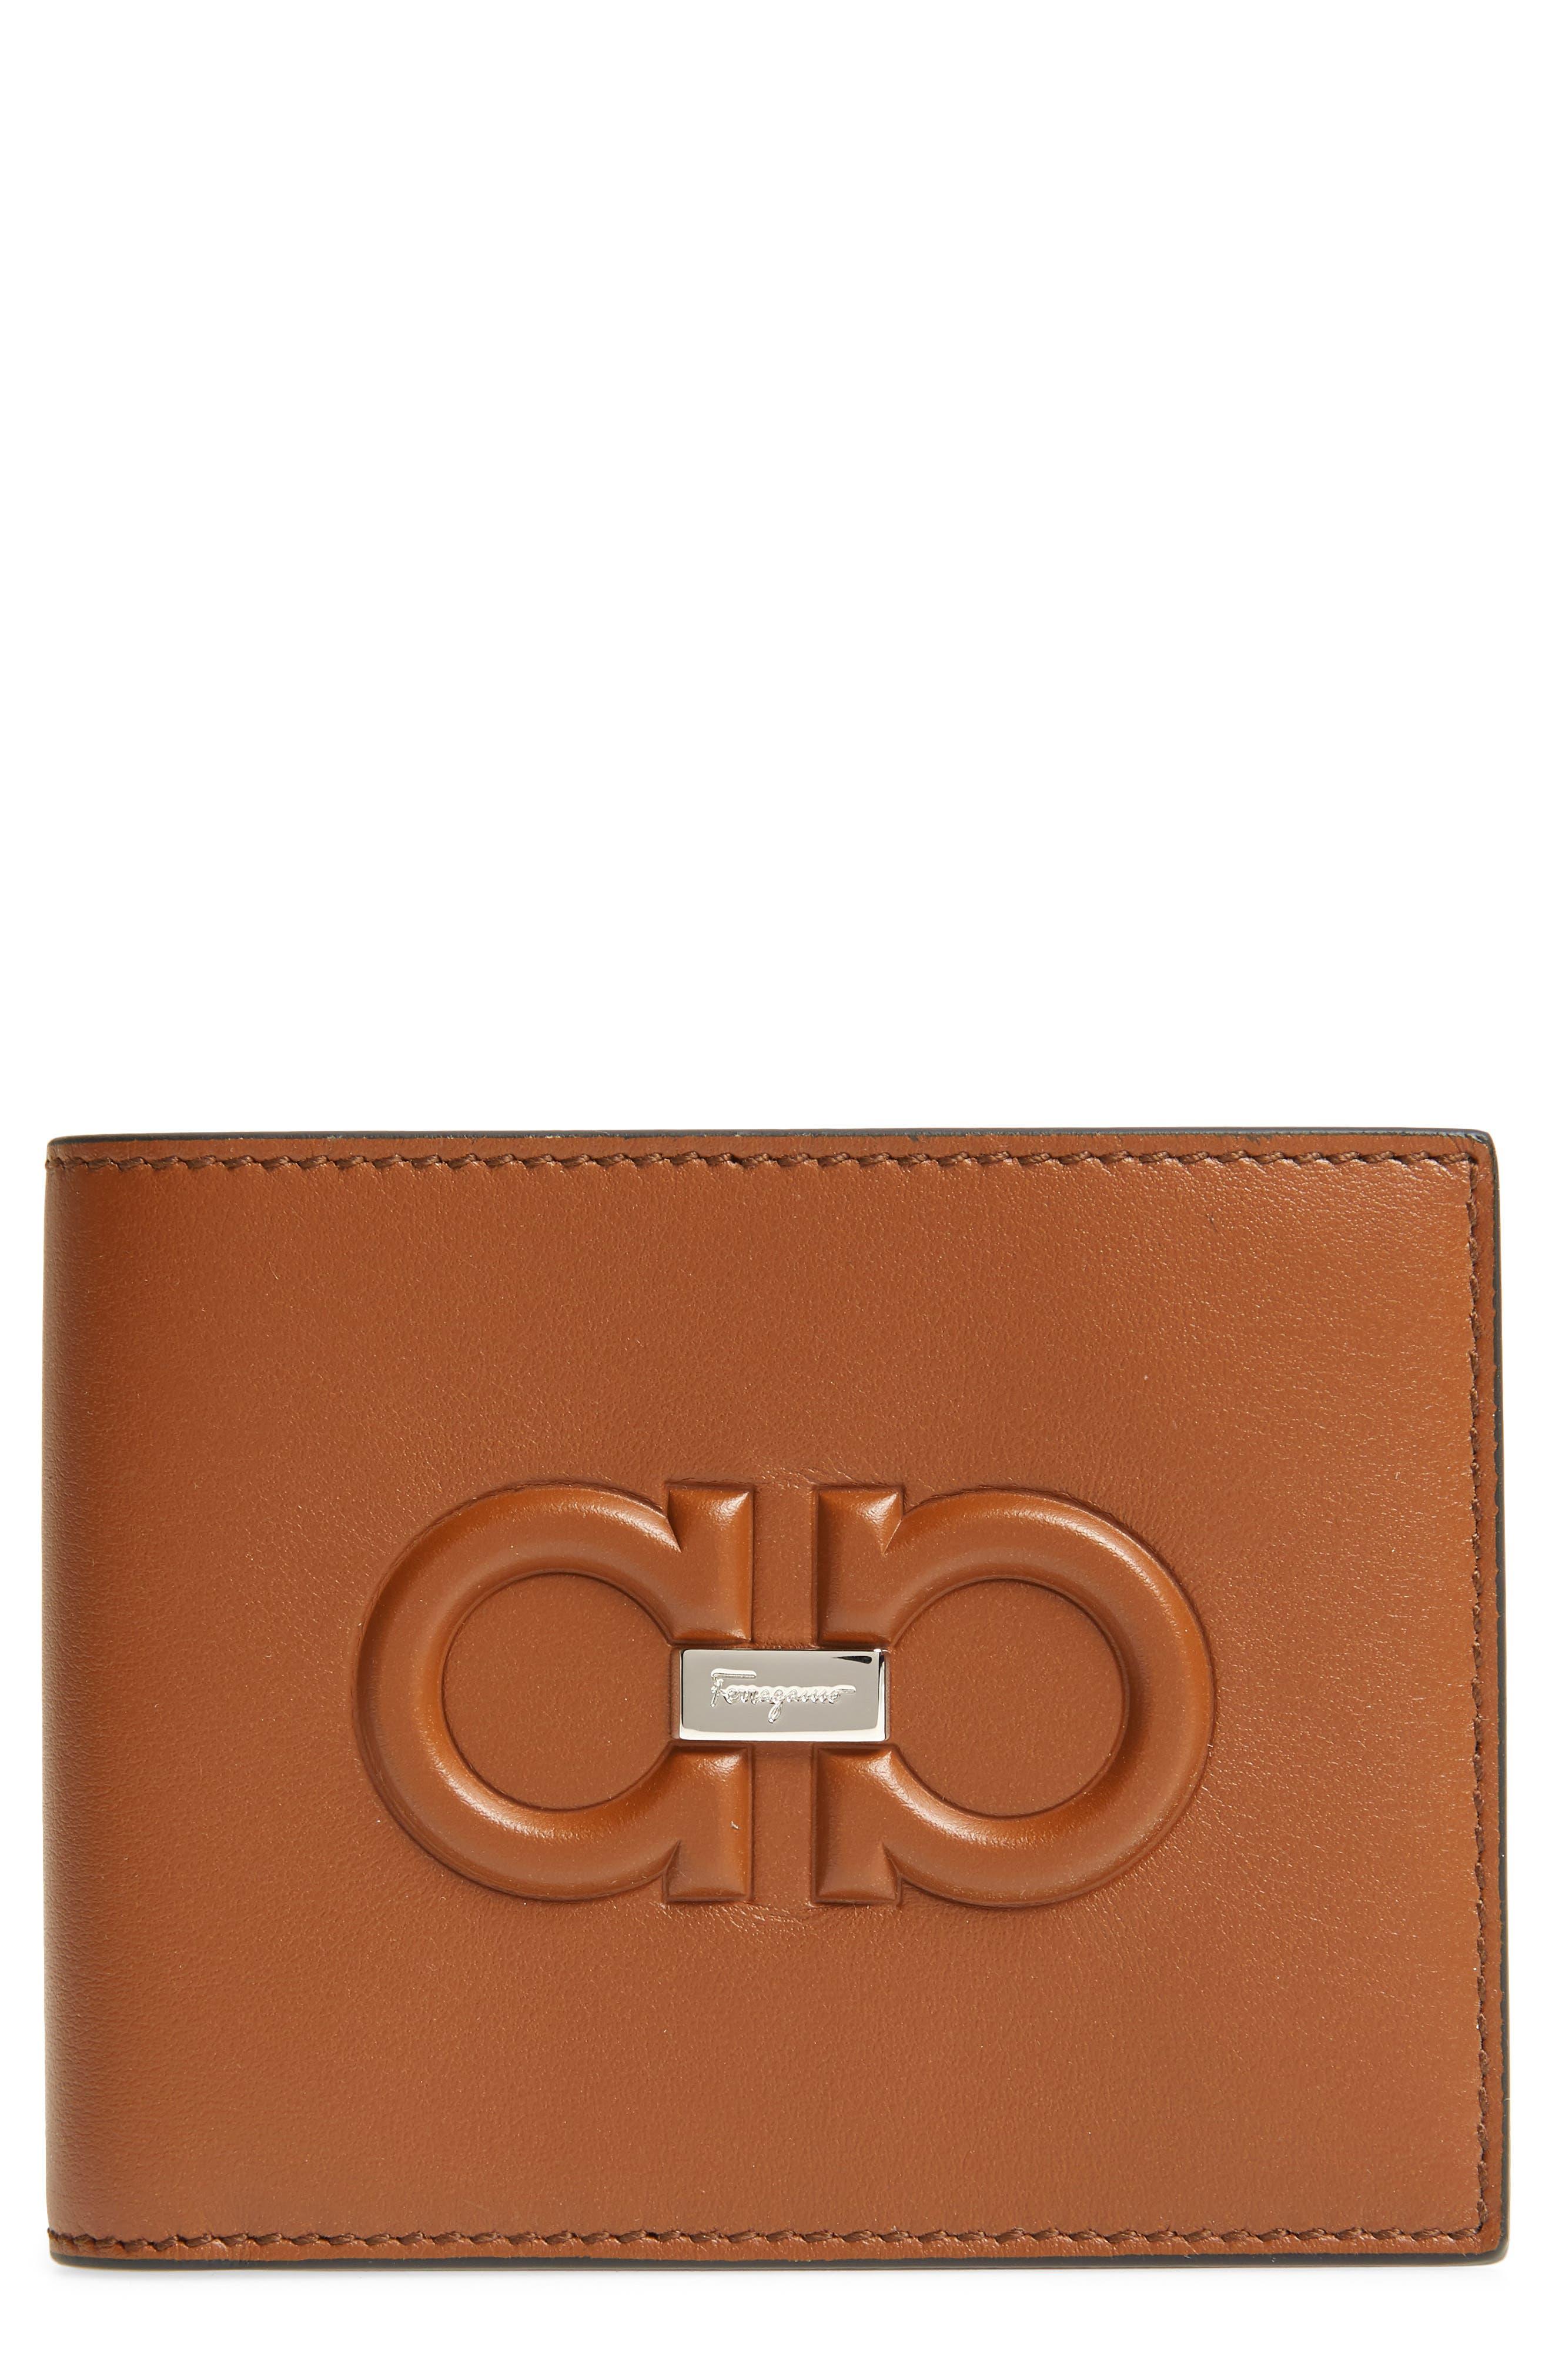 SALVATORE FERRAGAMO Firenze Logo Leather Wallet, Main, color, 200